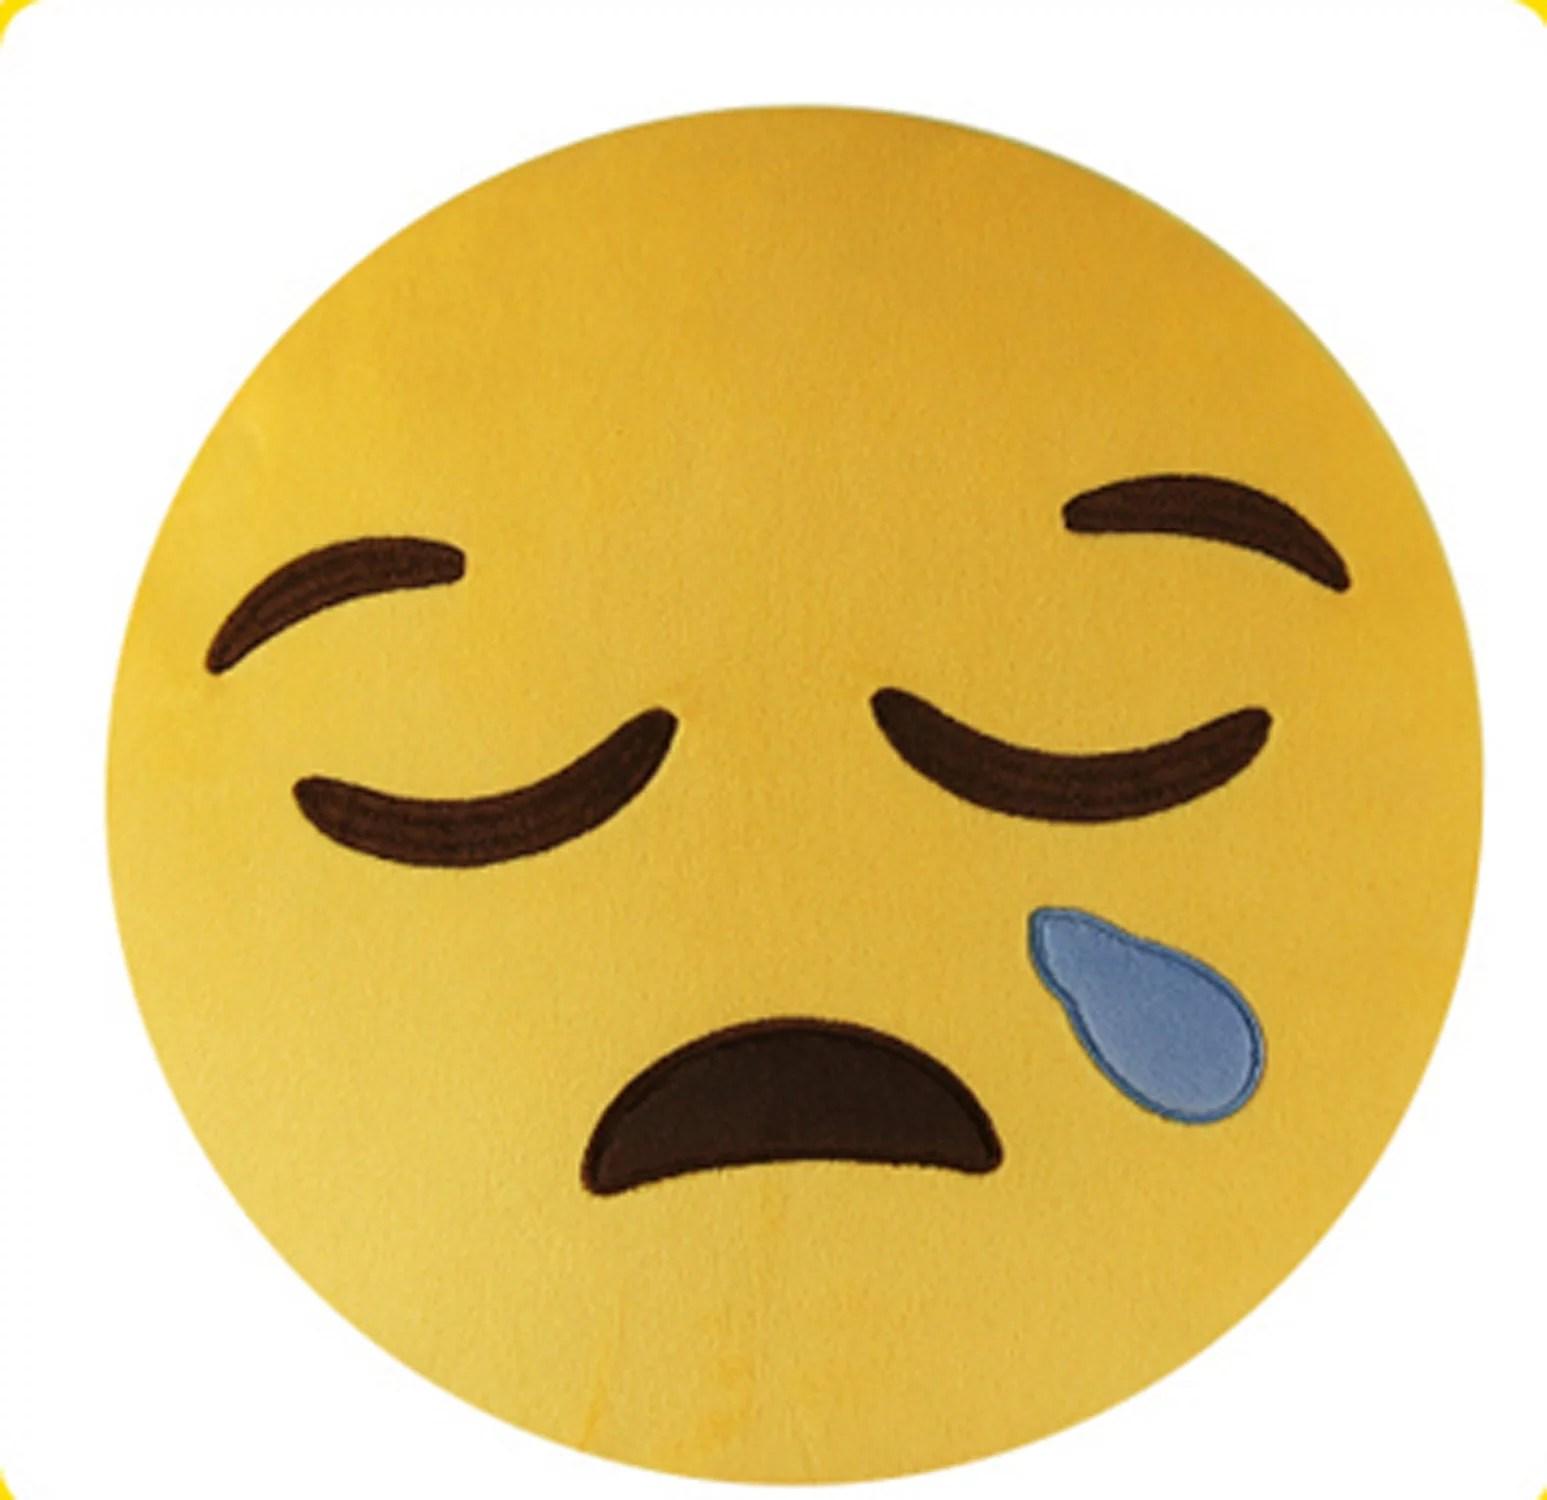 bh toys emoji plush